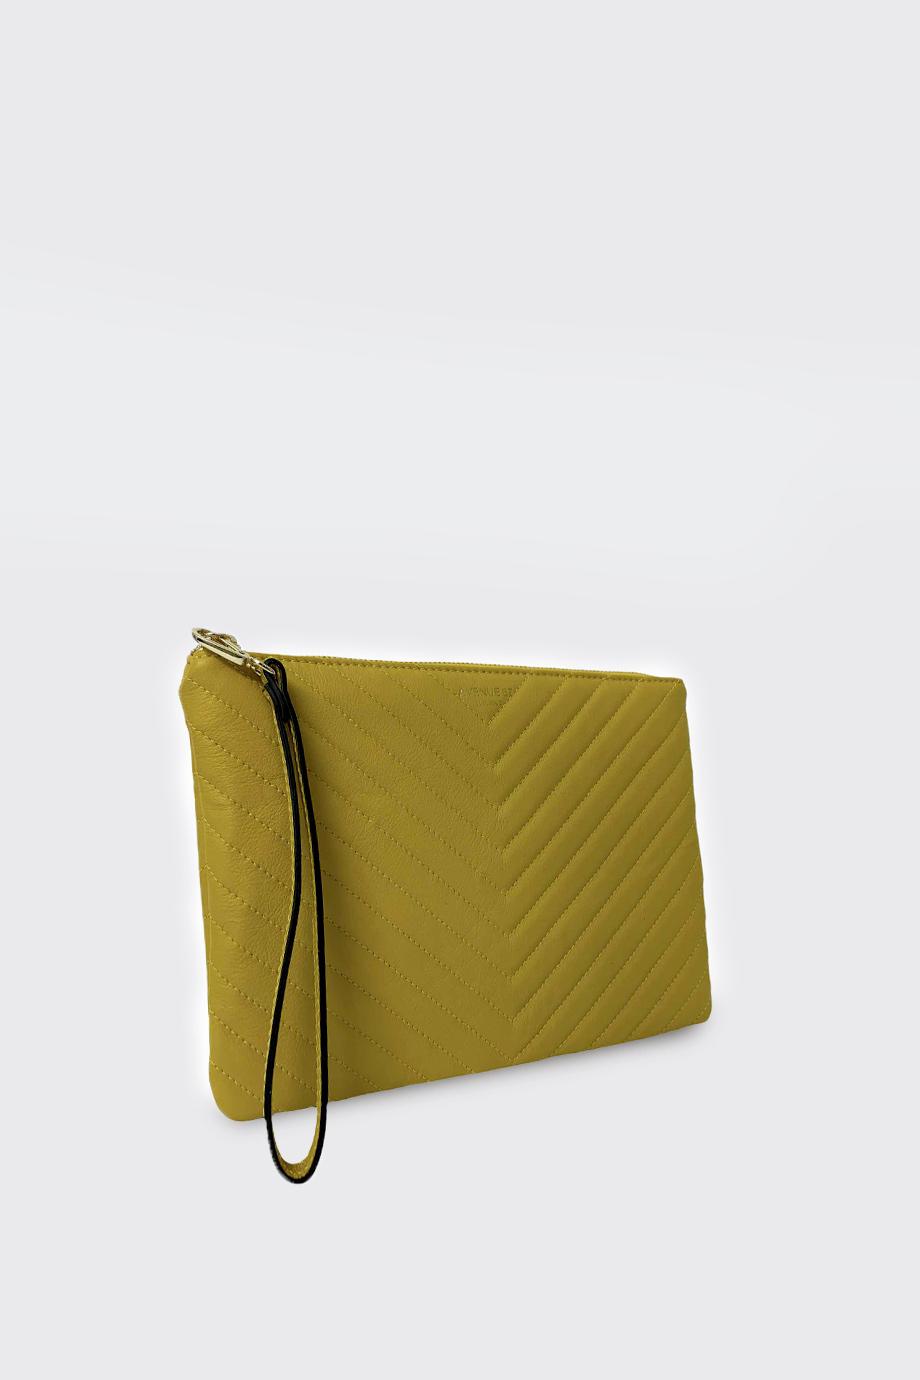 mini bag Tina wave senape avenue 67